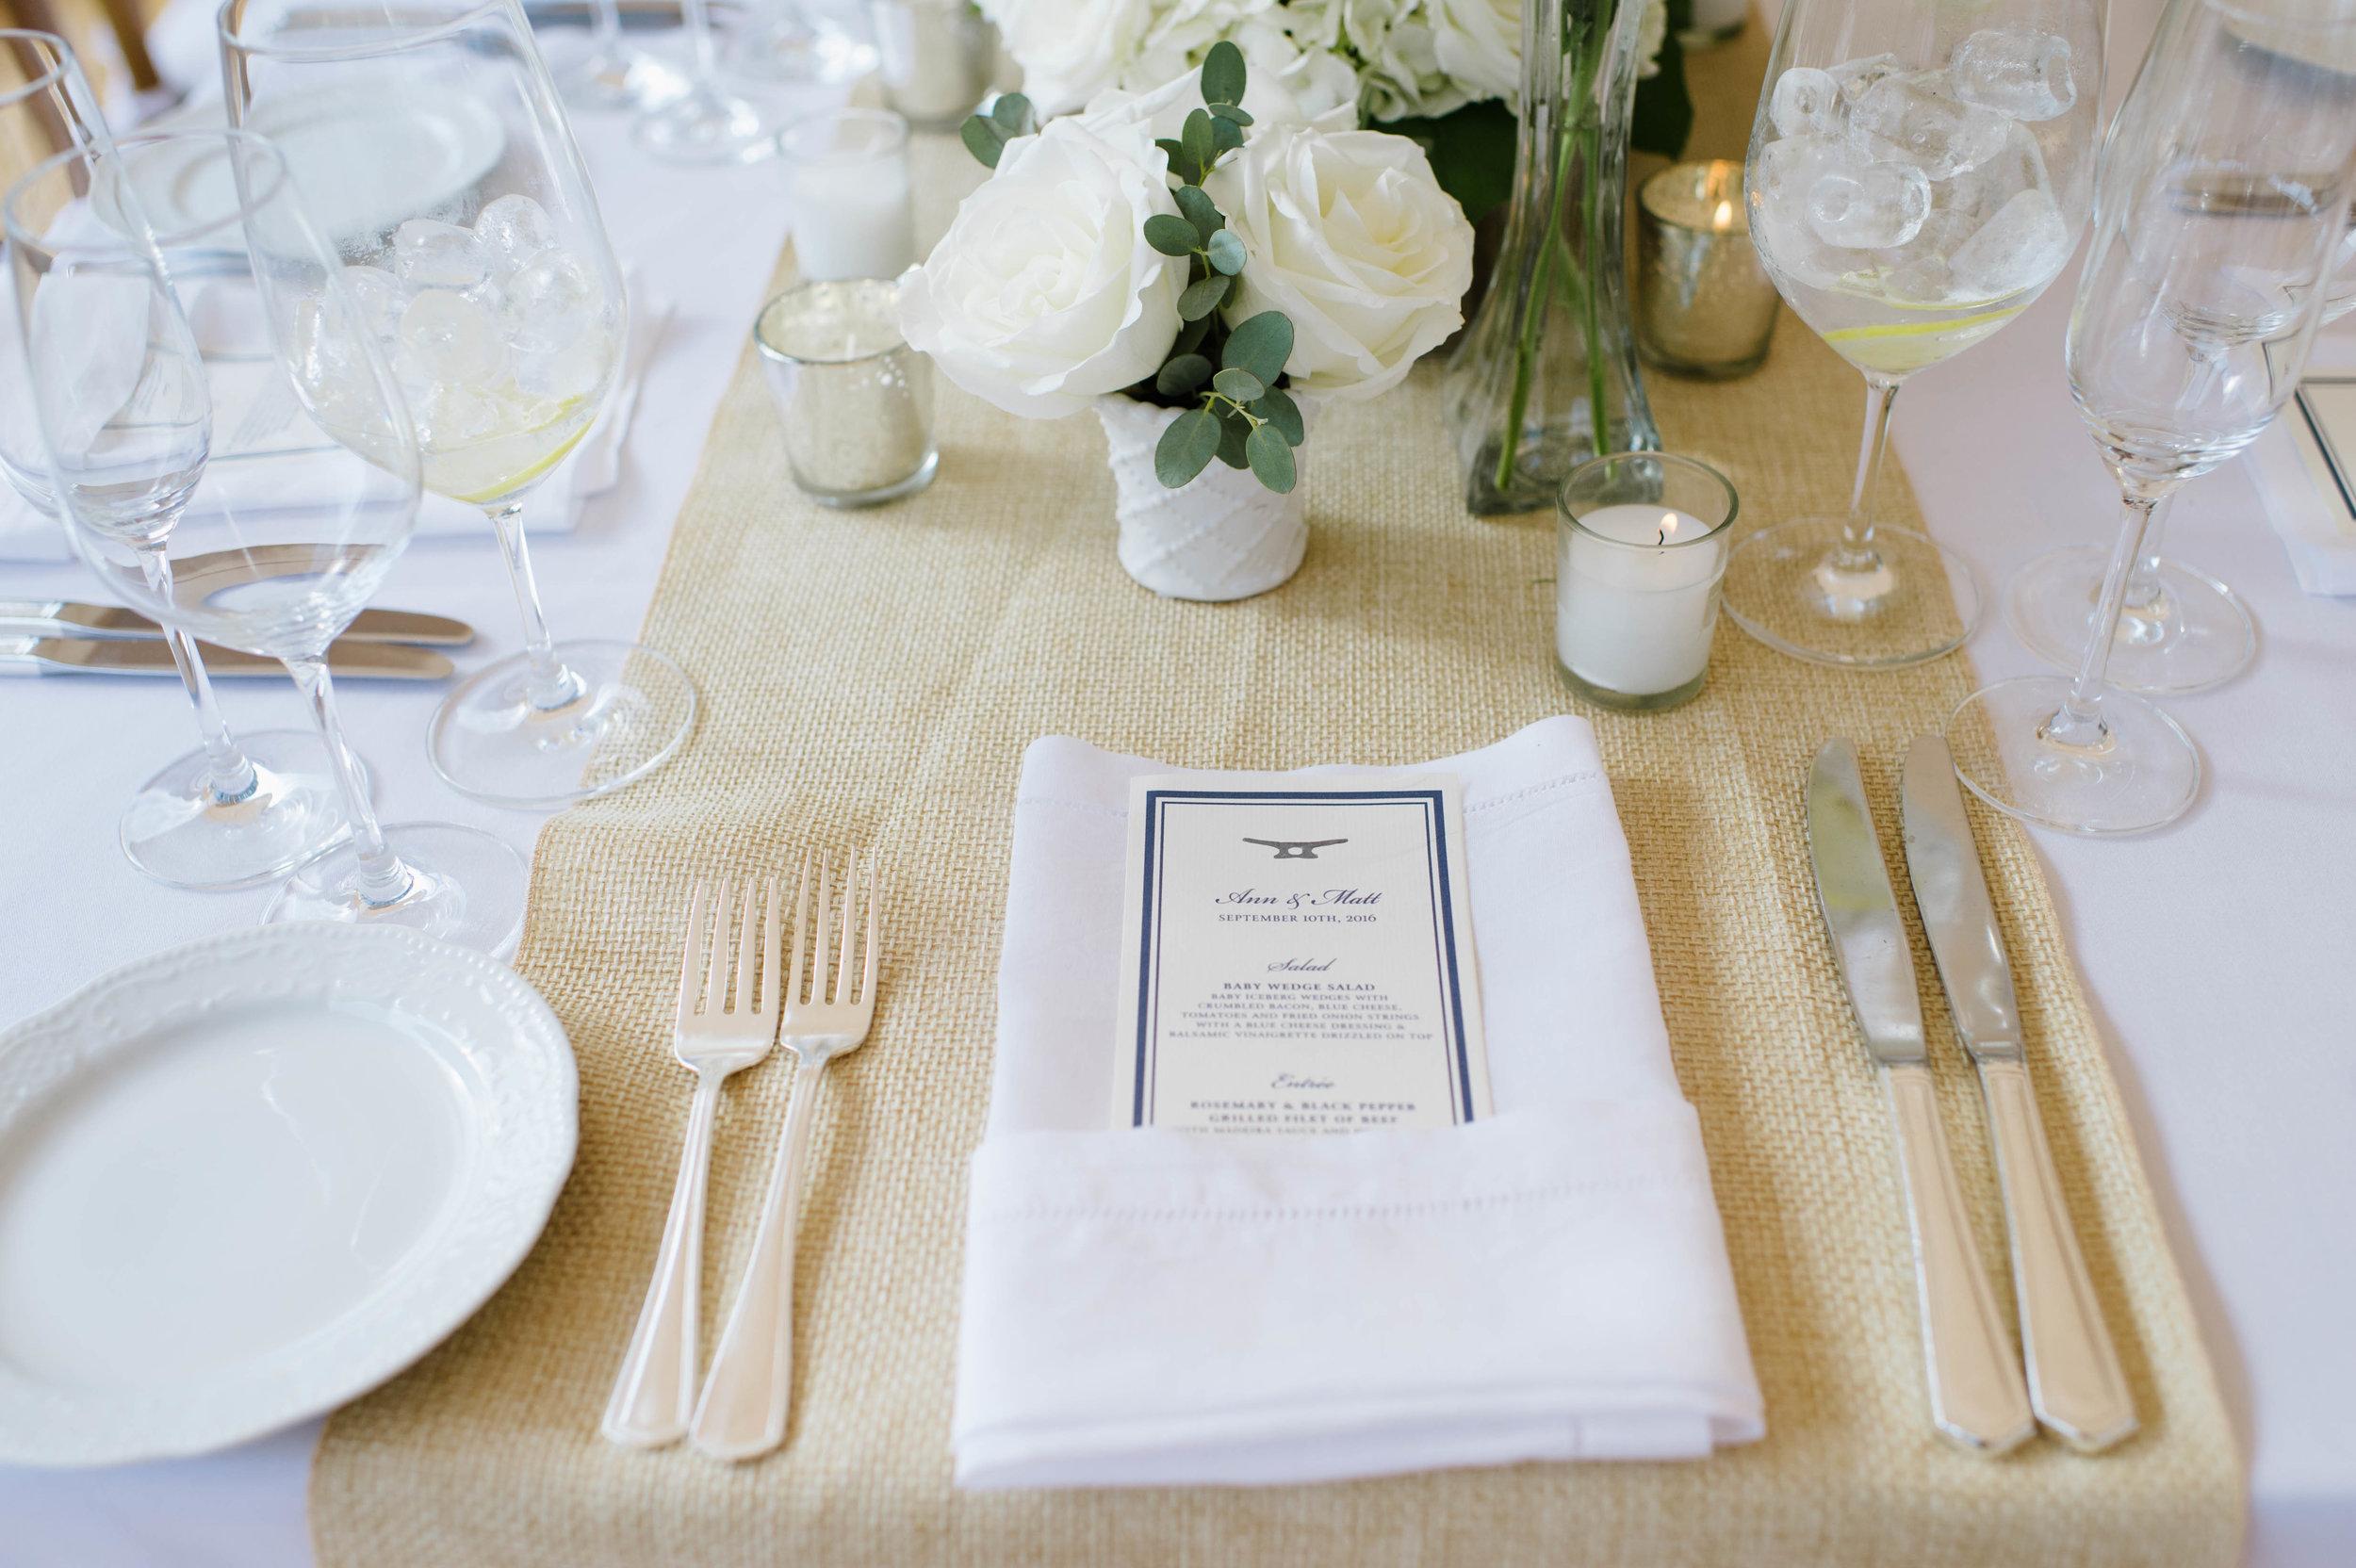 Candid-Wedding-Photography026.jpg